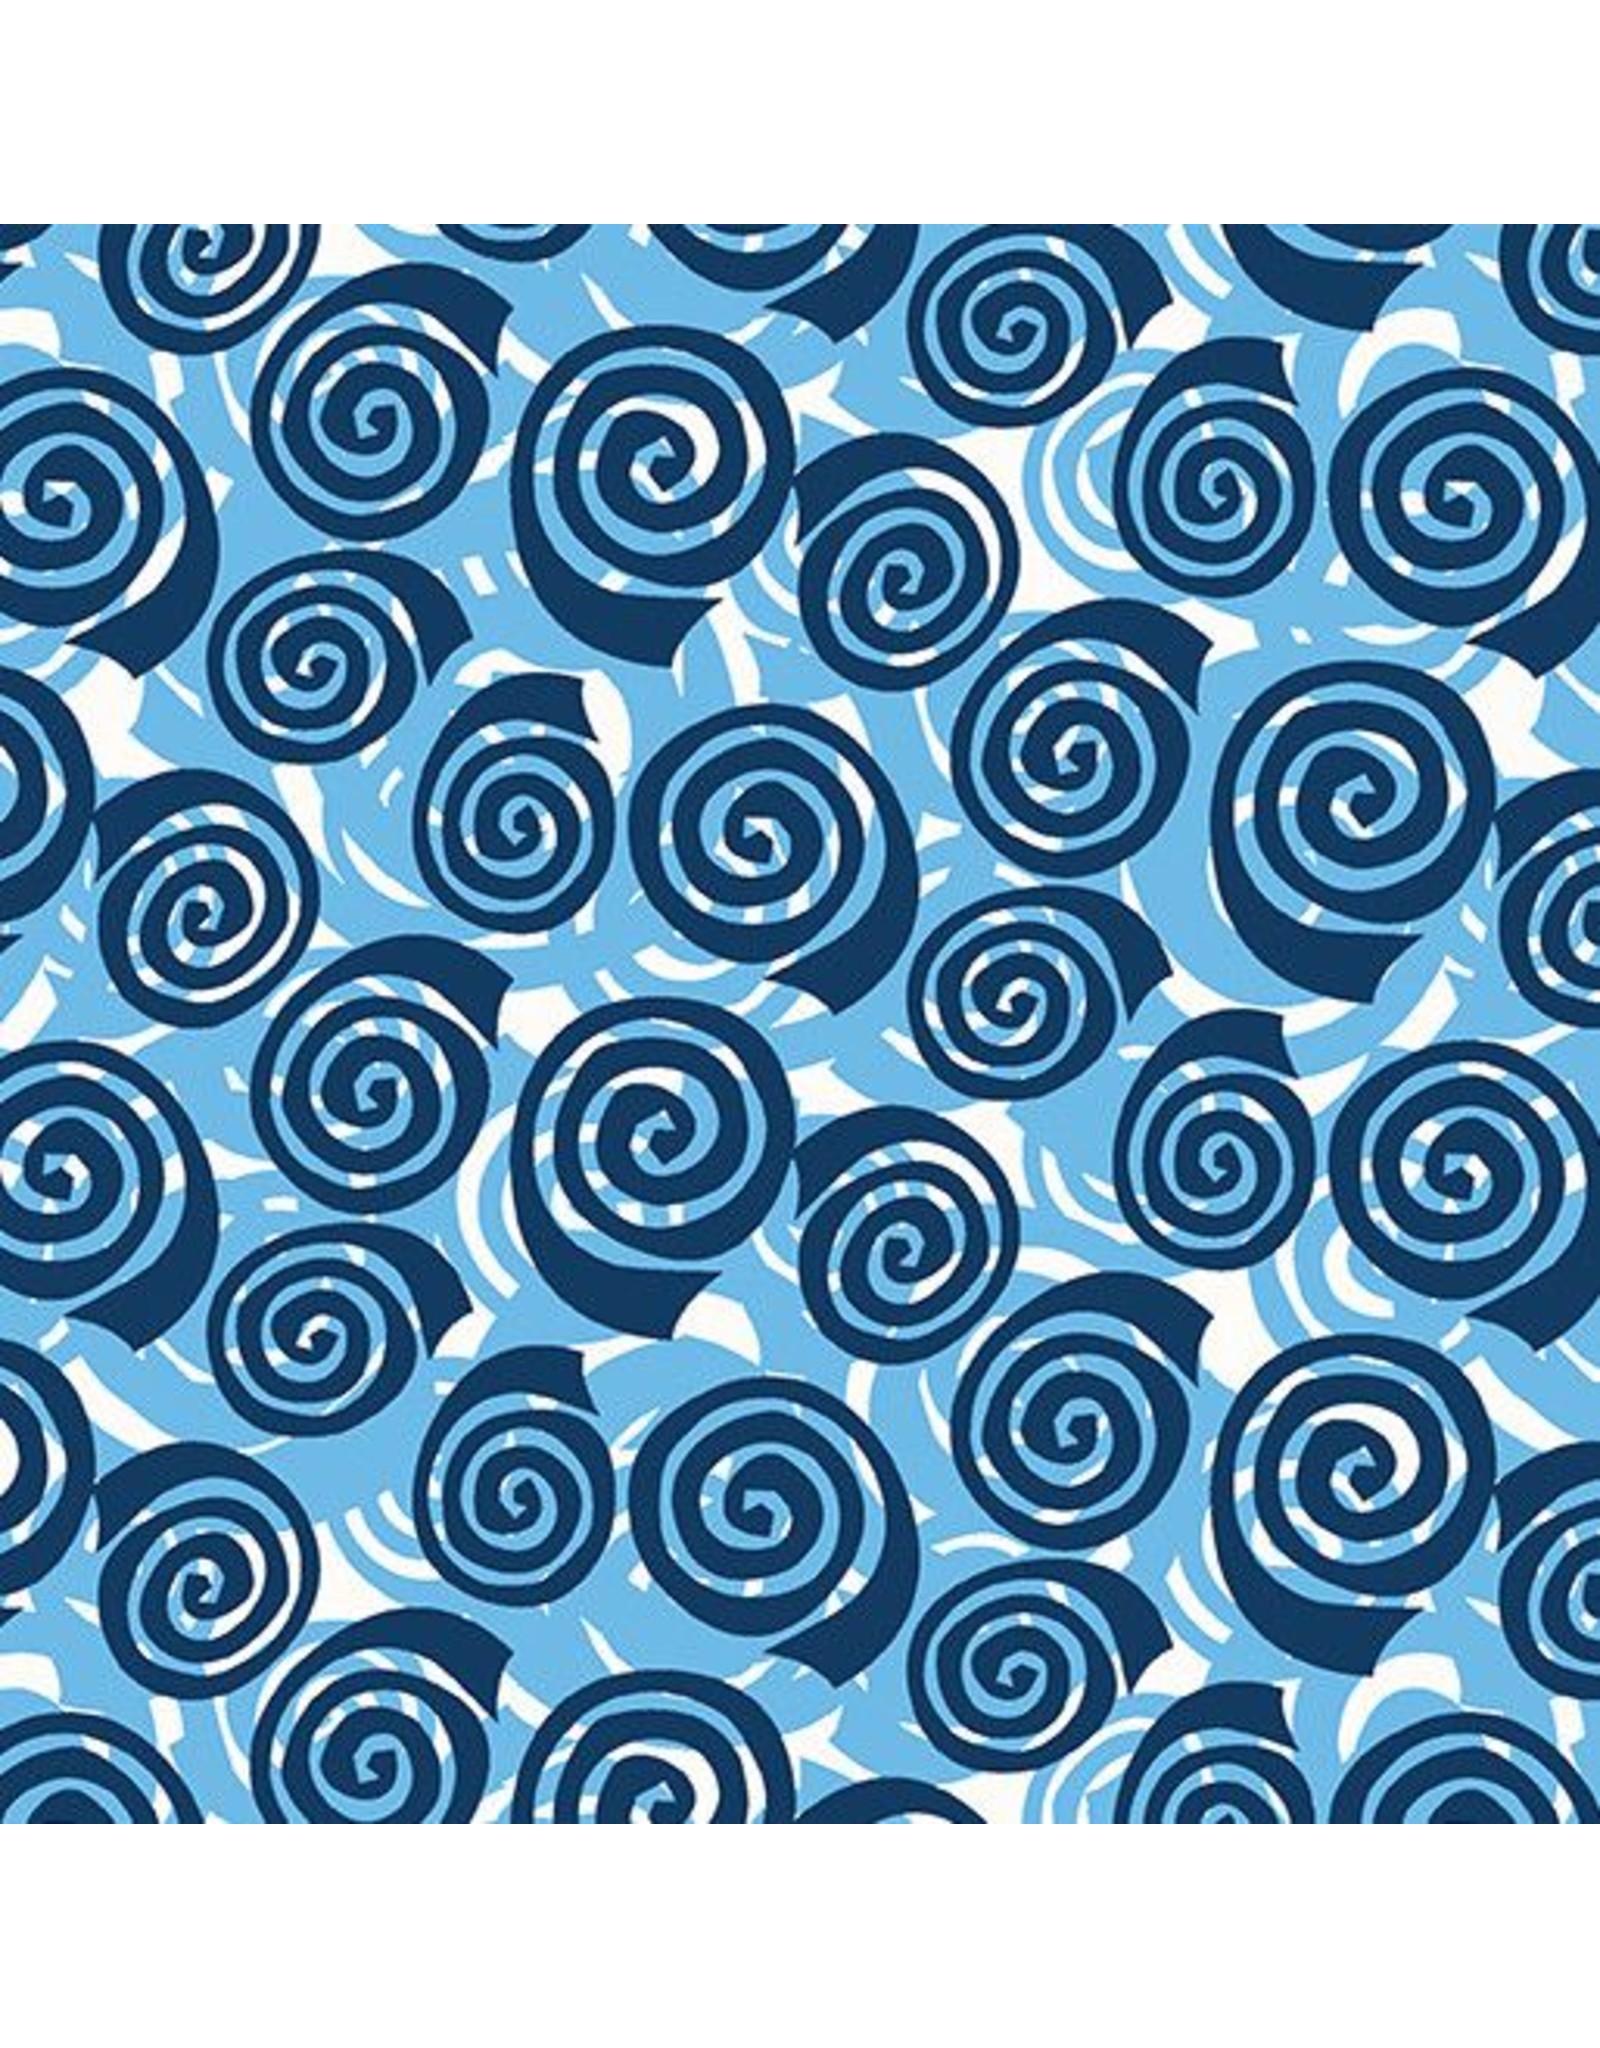 Contempo Abstract Garden - Blooming Roses Blue